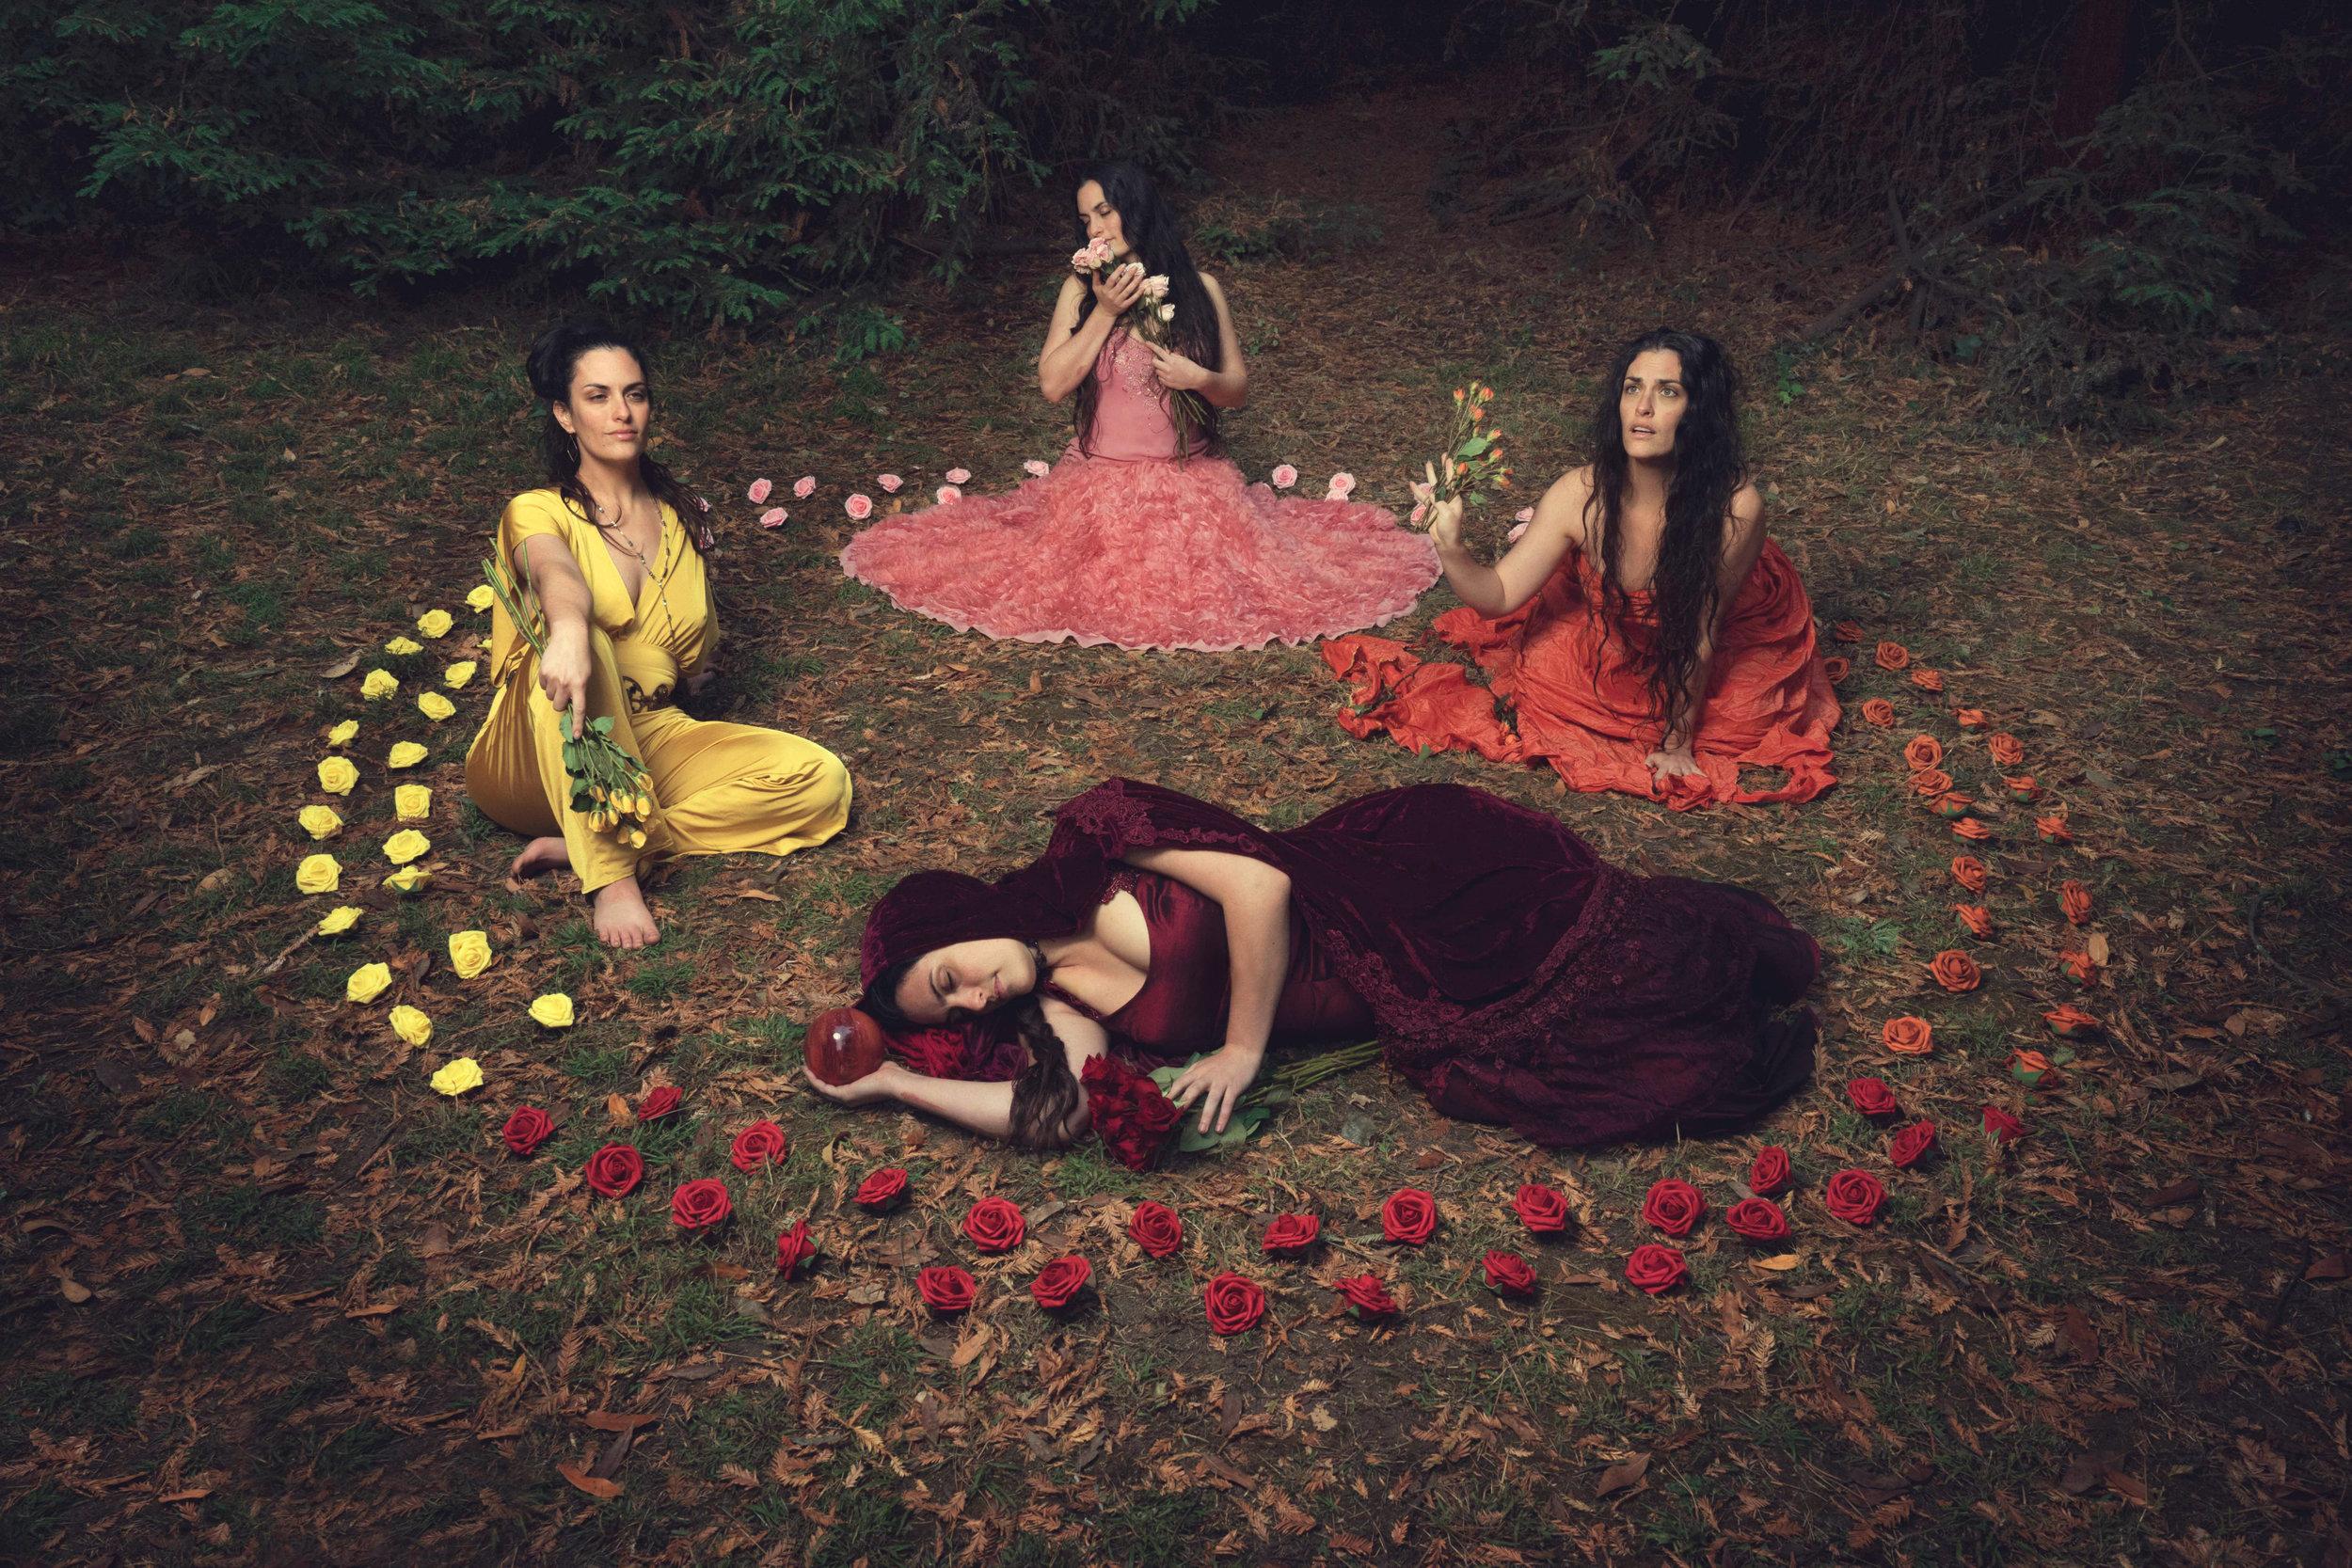 Marya_stark_rose_hoop_queen_womb_cycles_moon_menstrual_wisdom_healing_awakening_feminine_rhythm.jpg